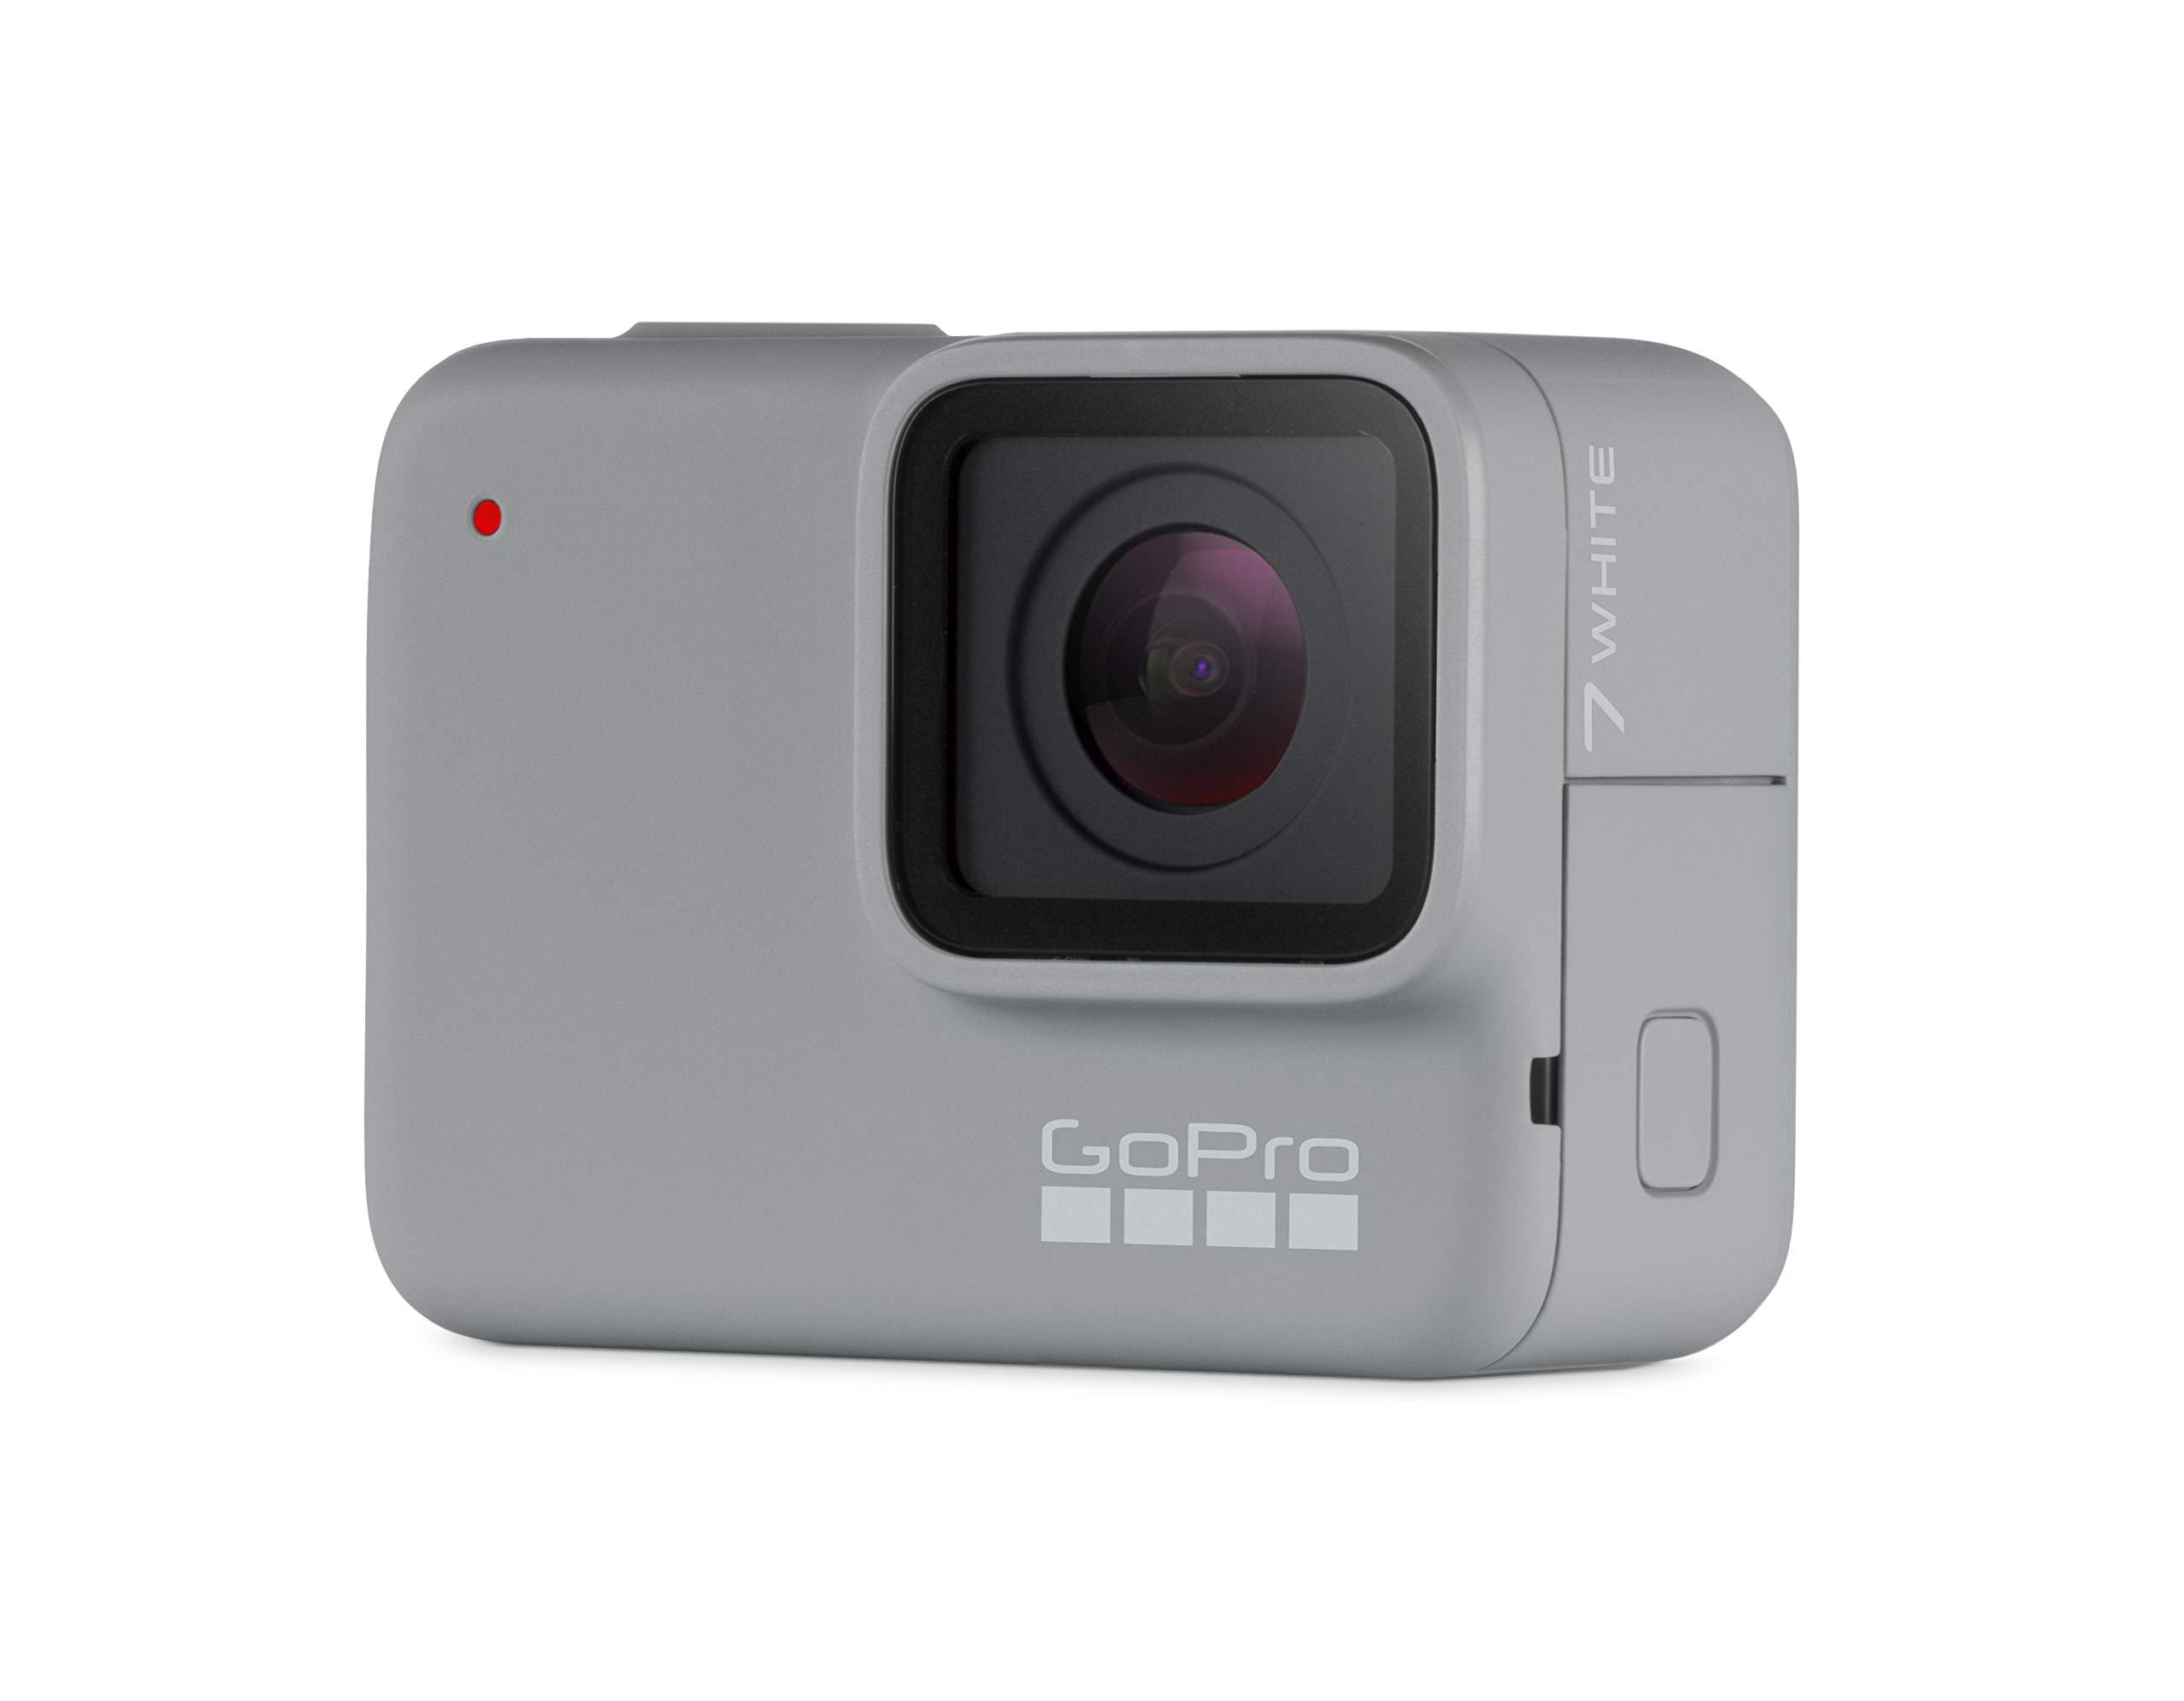 GoPro HERO7 White - Waterproof Digital Action Camera with Sleeve Plus Lanyard 12